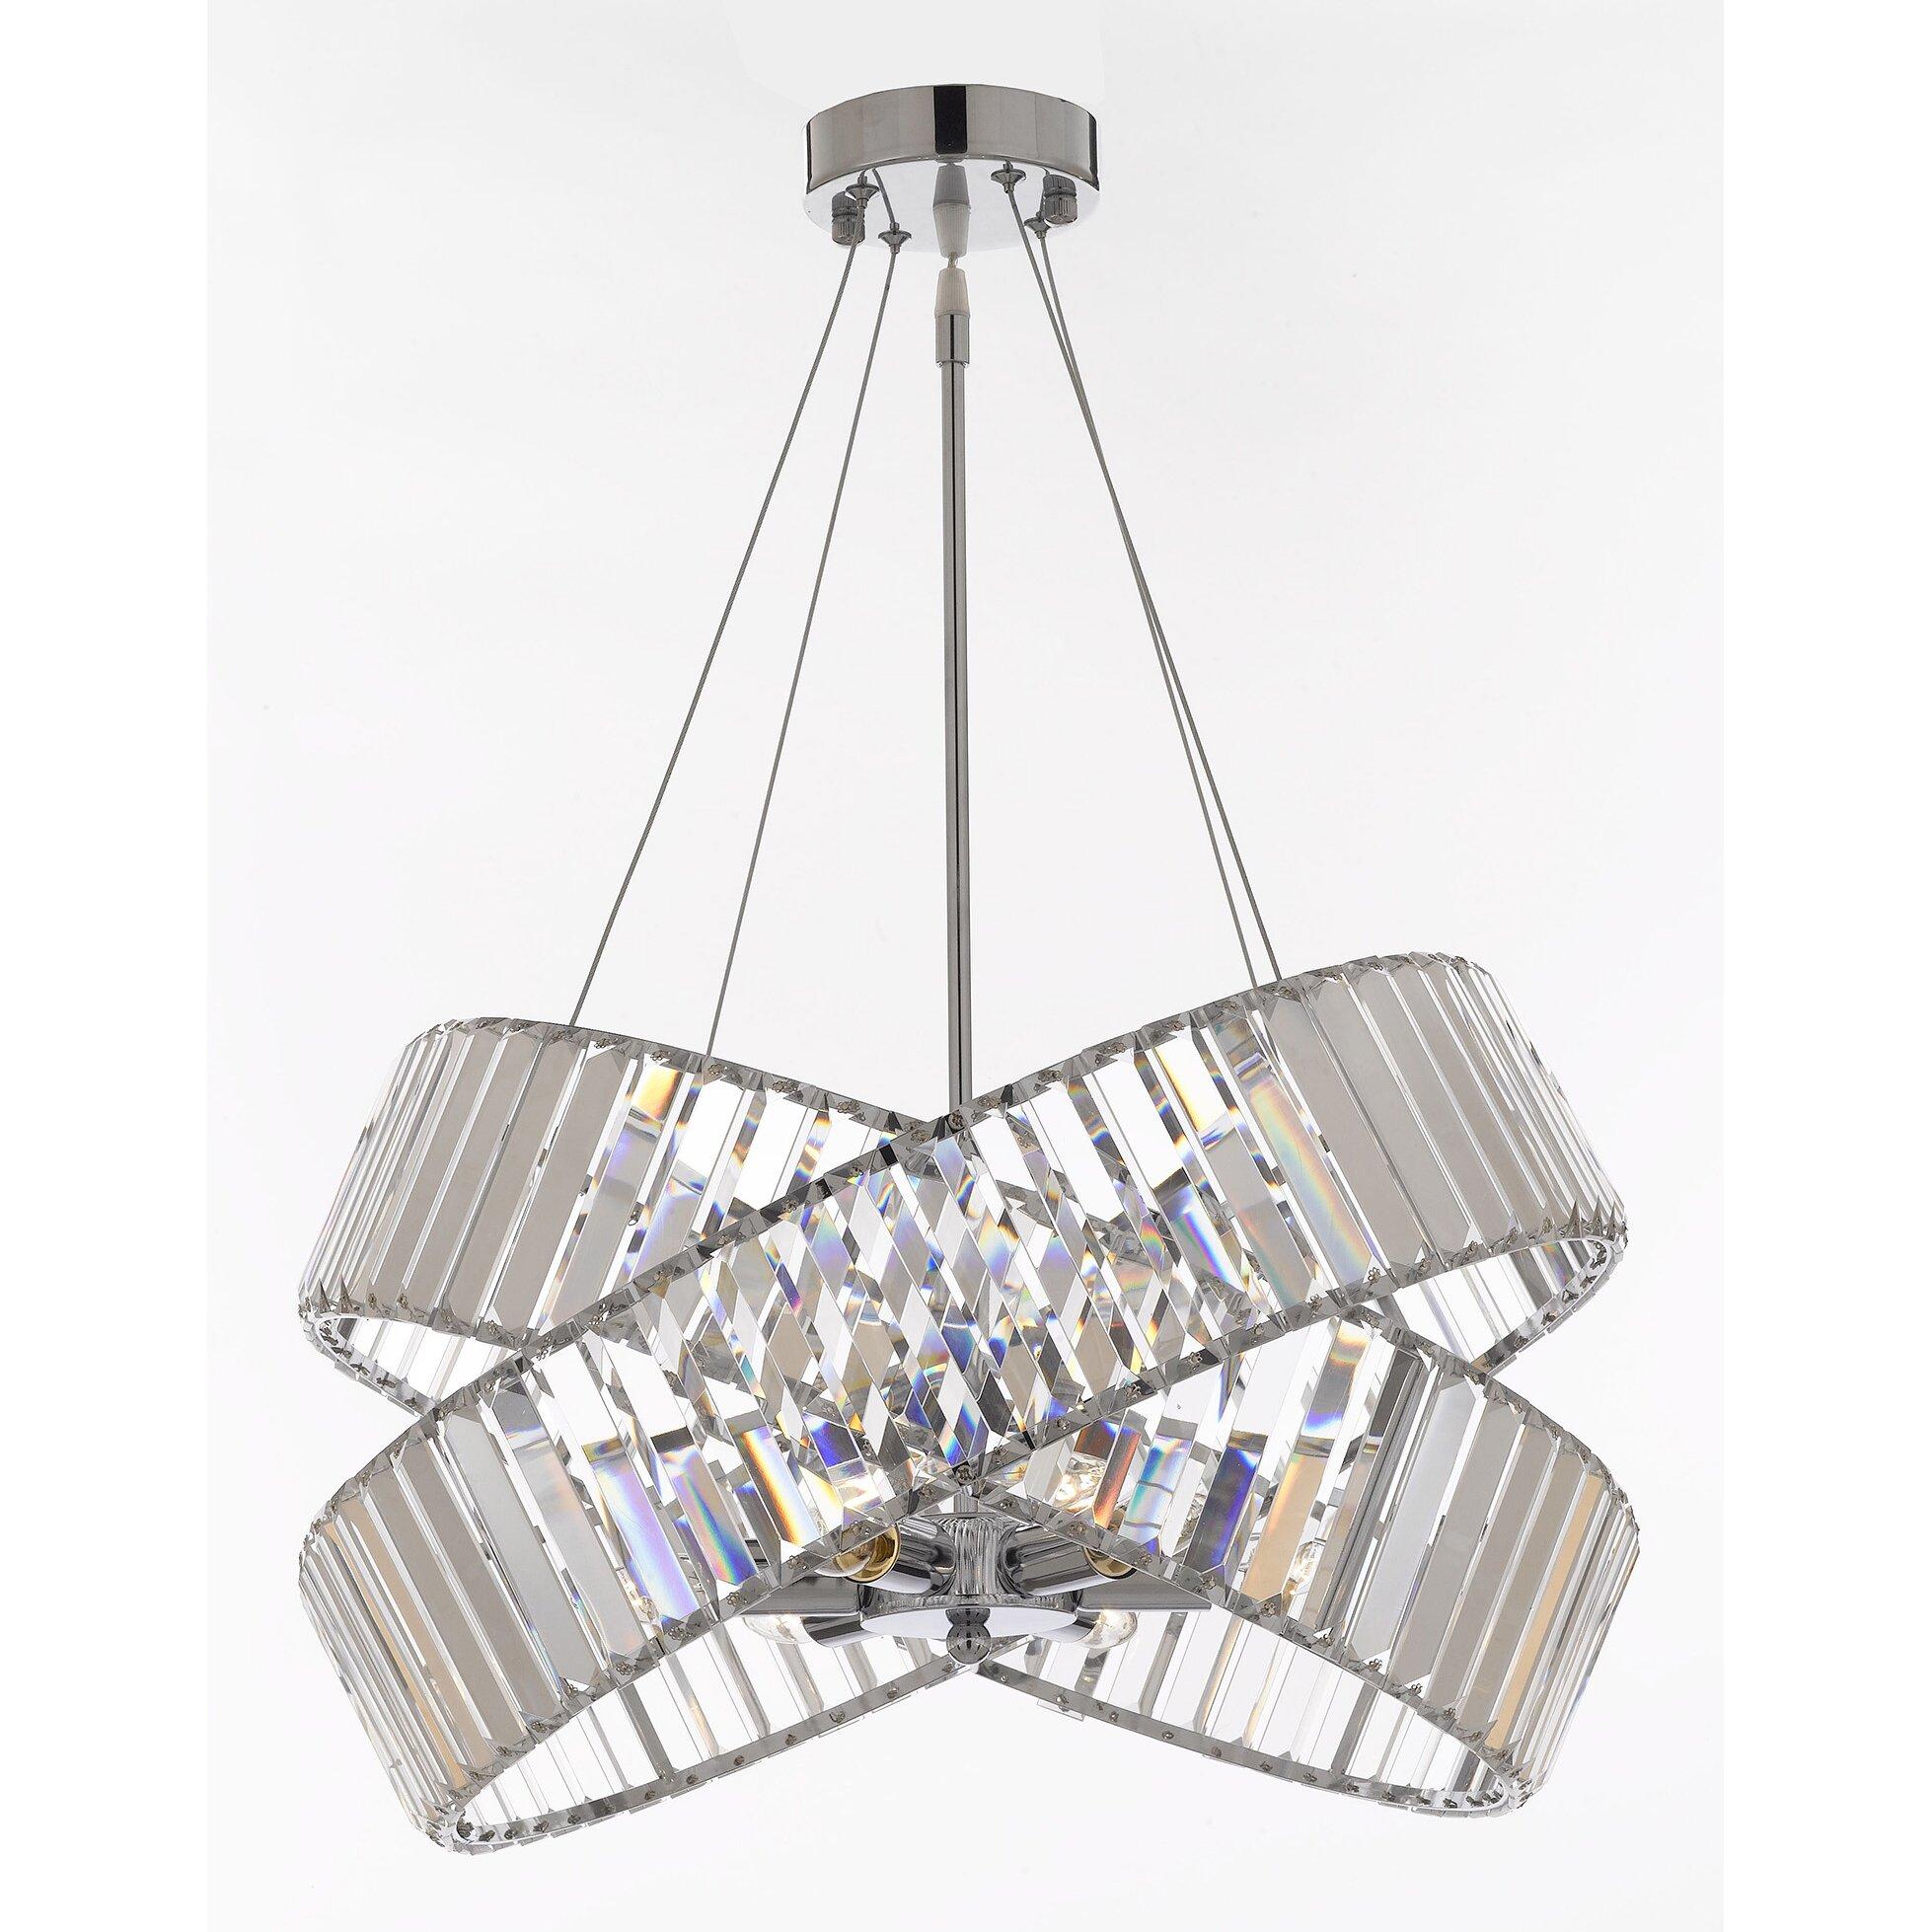 Harrison lane 6 light crystal chandelier wayfair for 6 light crystal chandelier